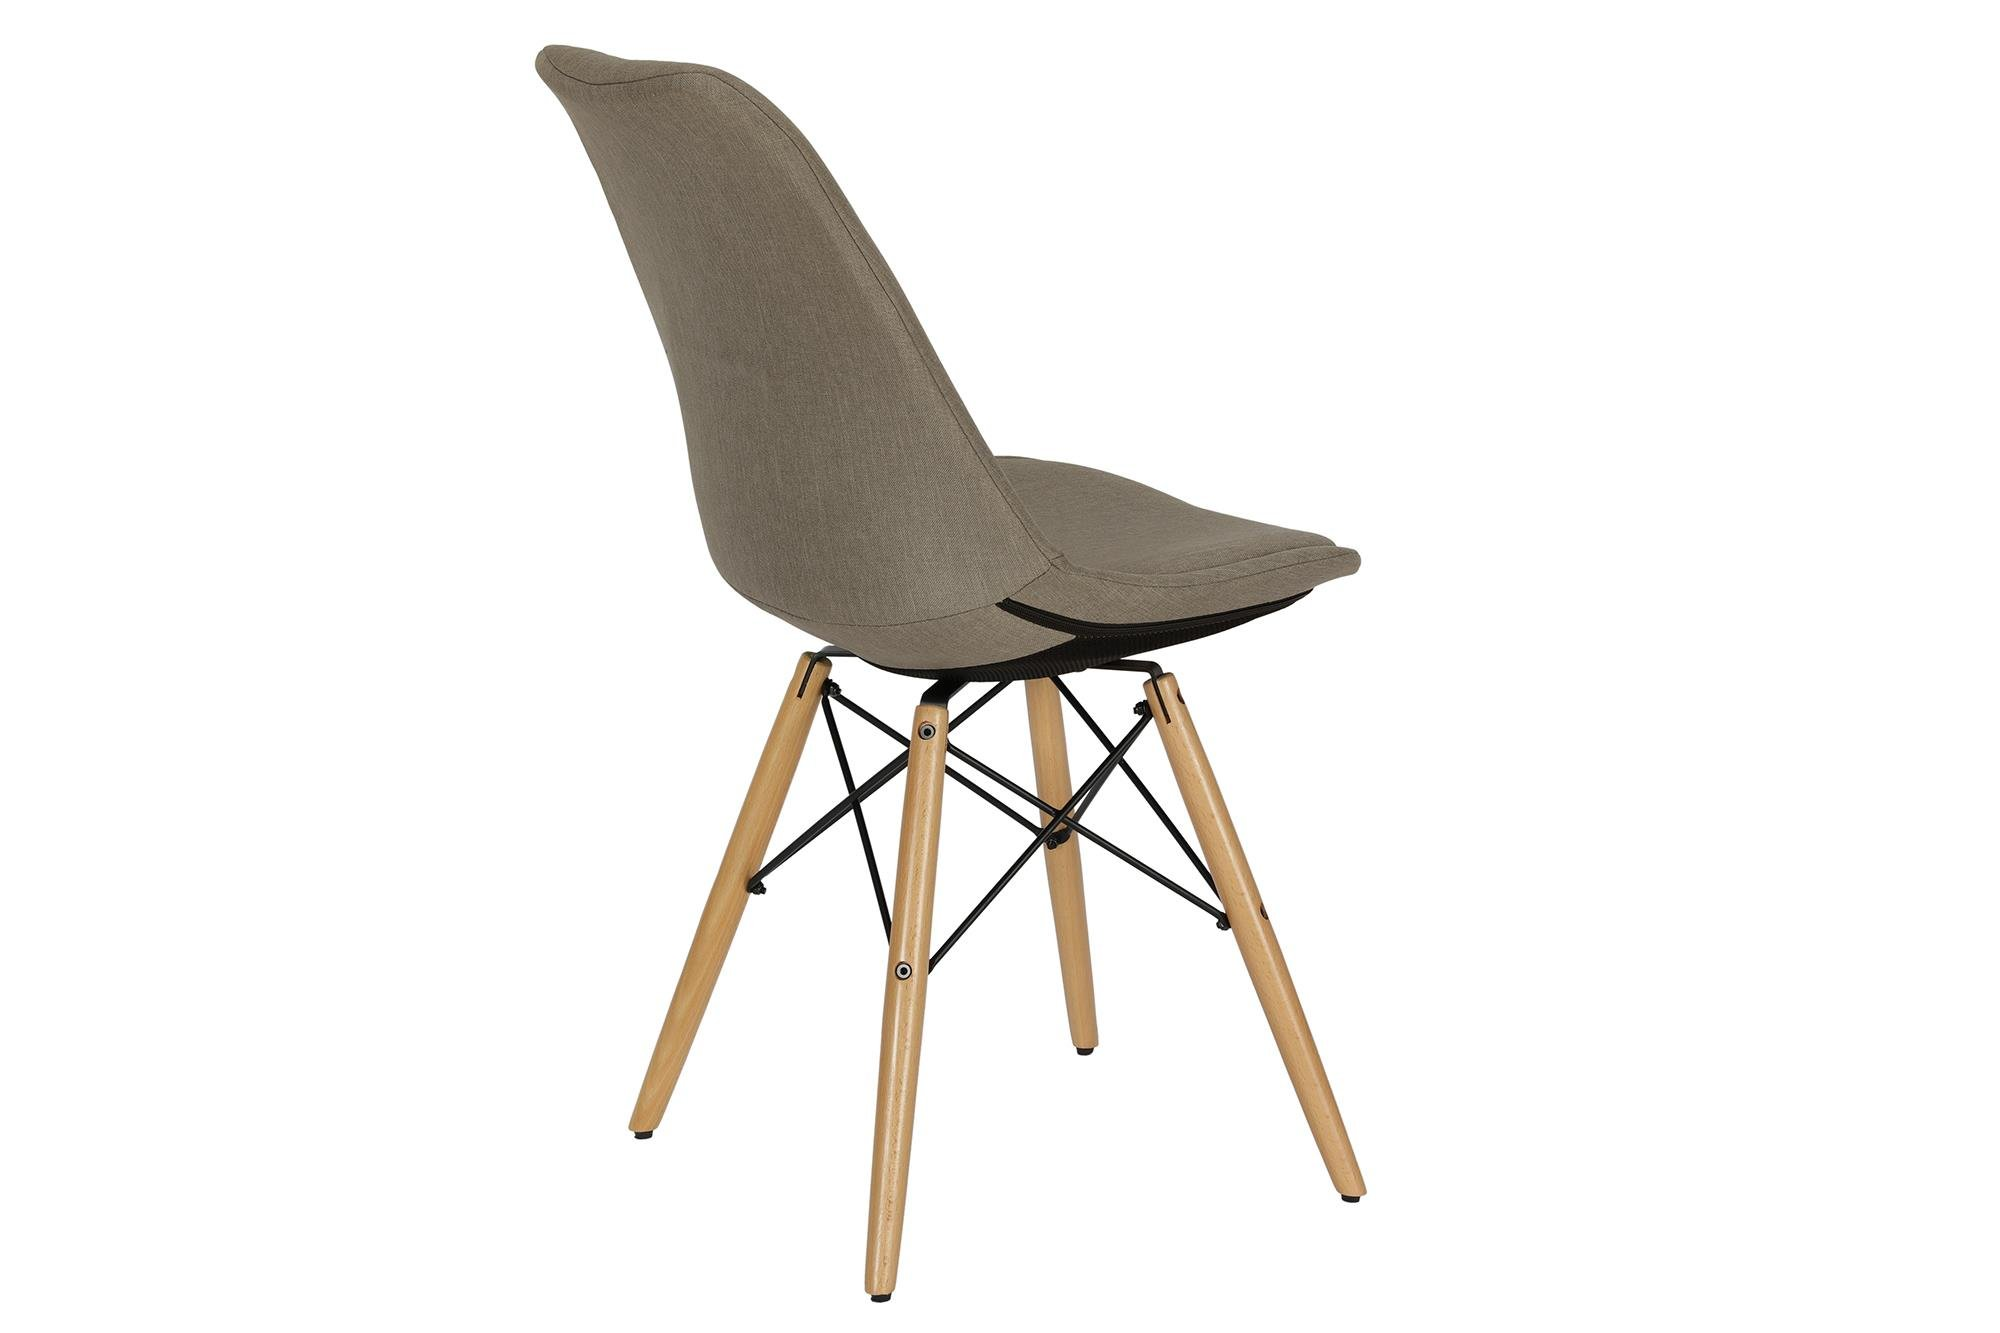 Novogratz Albany Classic Dining Chair in Rich Linen, Mid Century Modern Design, Grey Linen